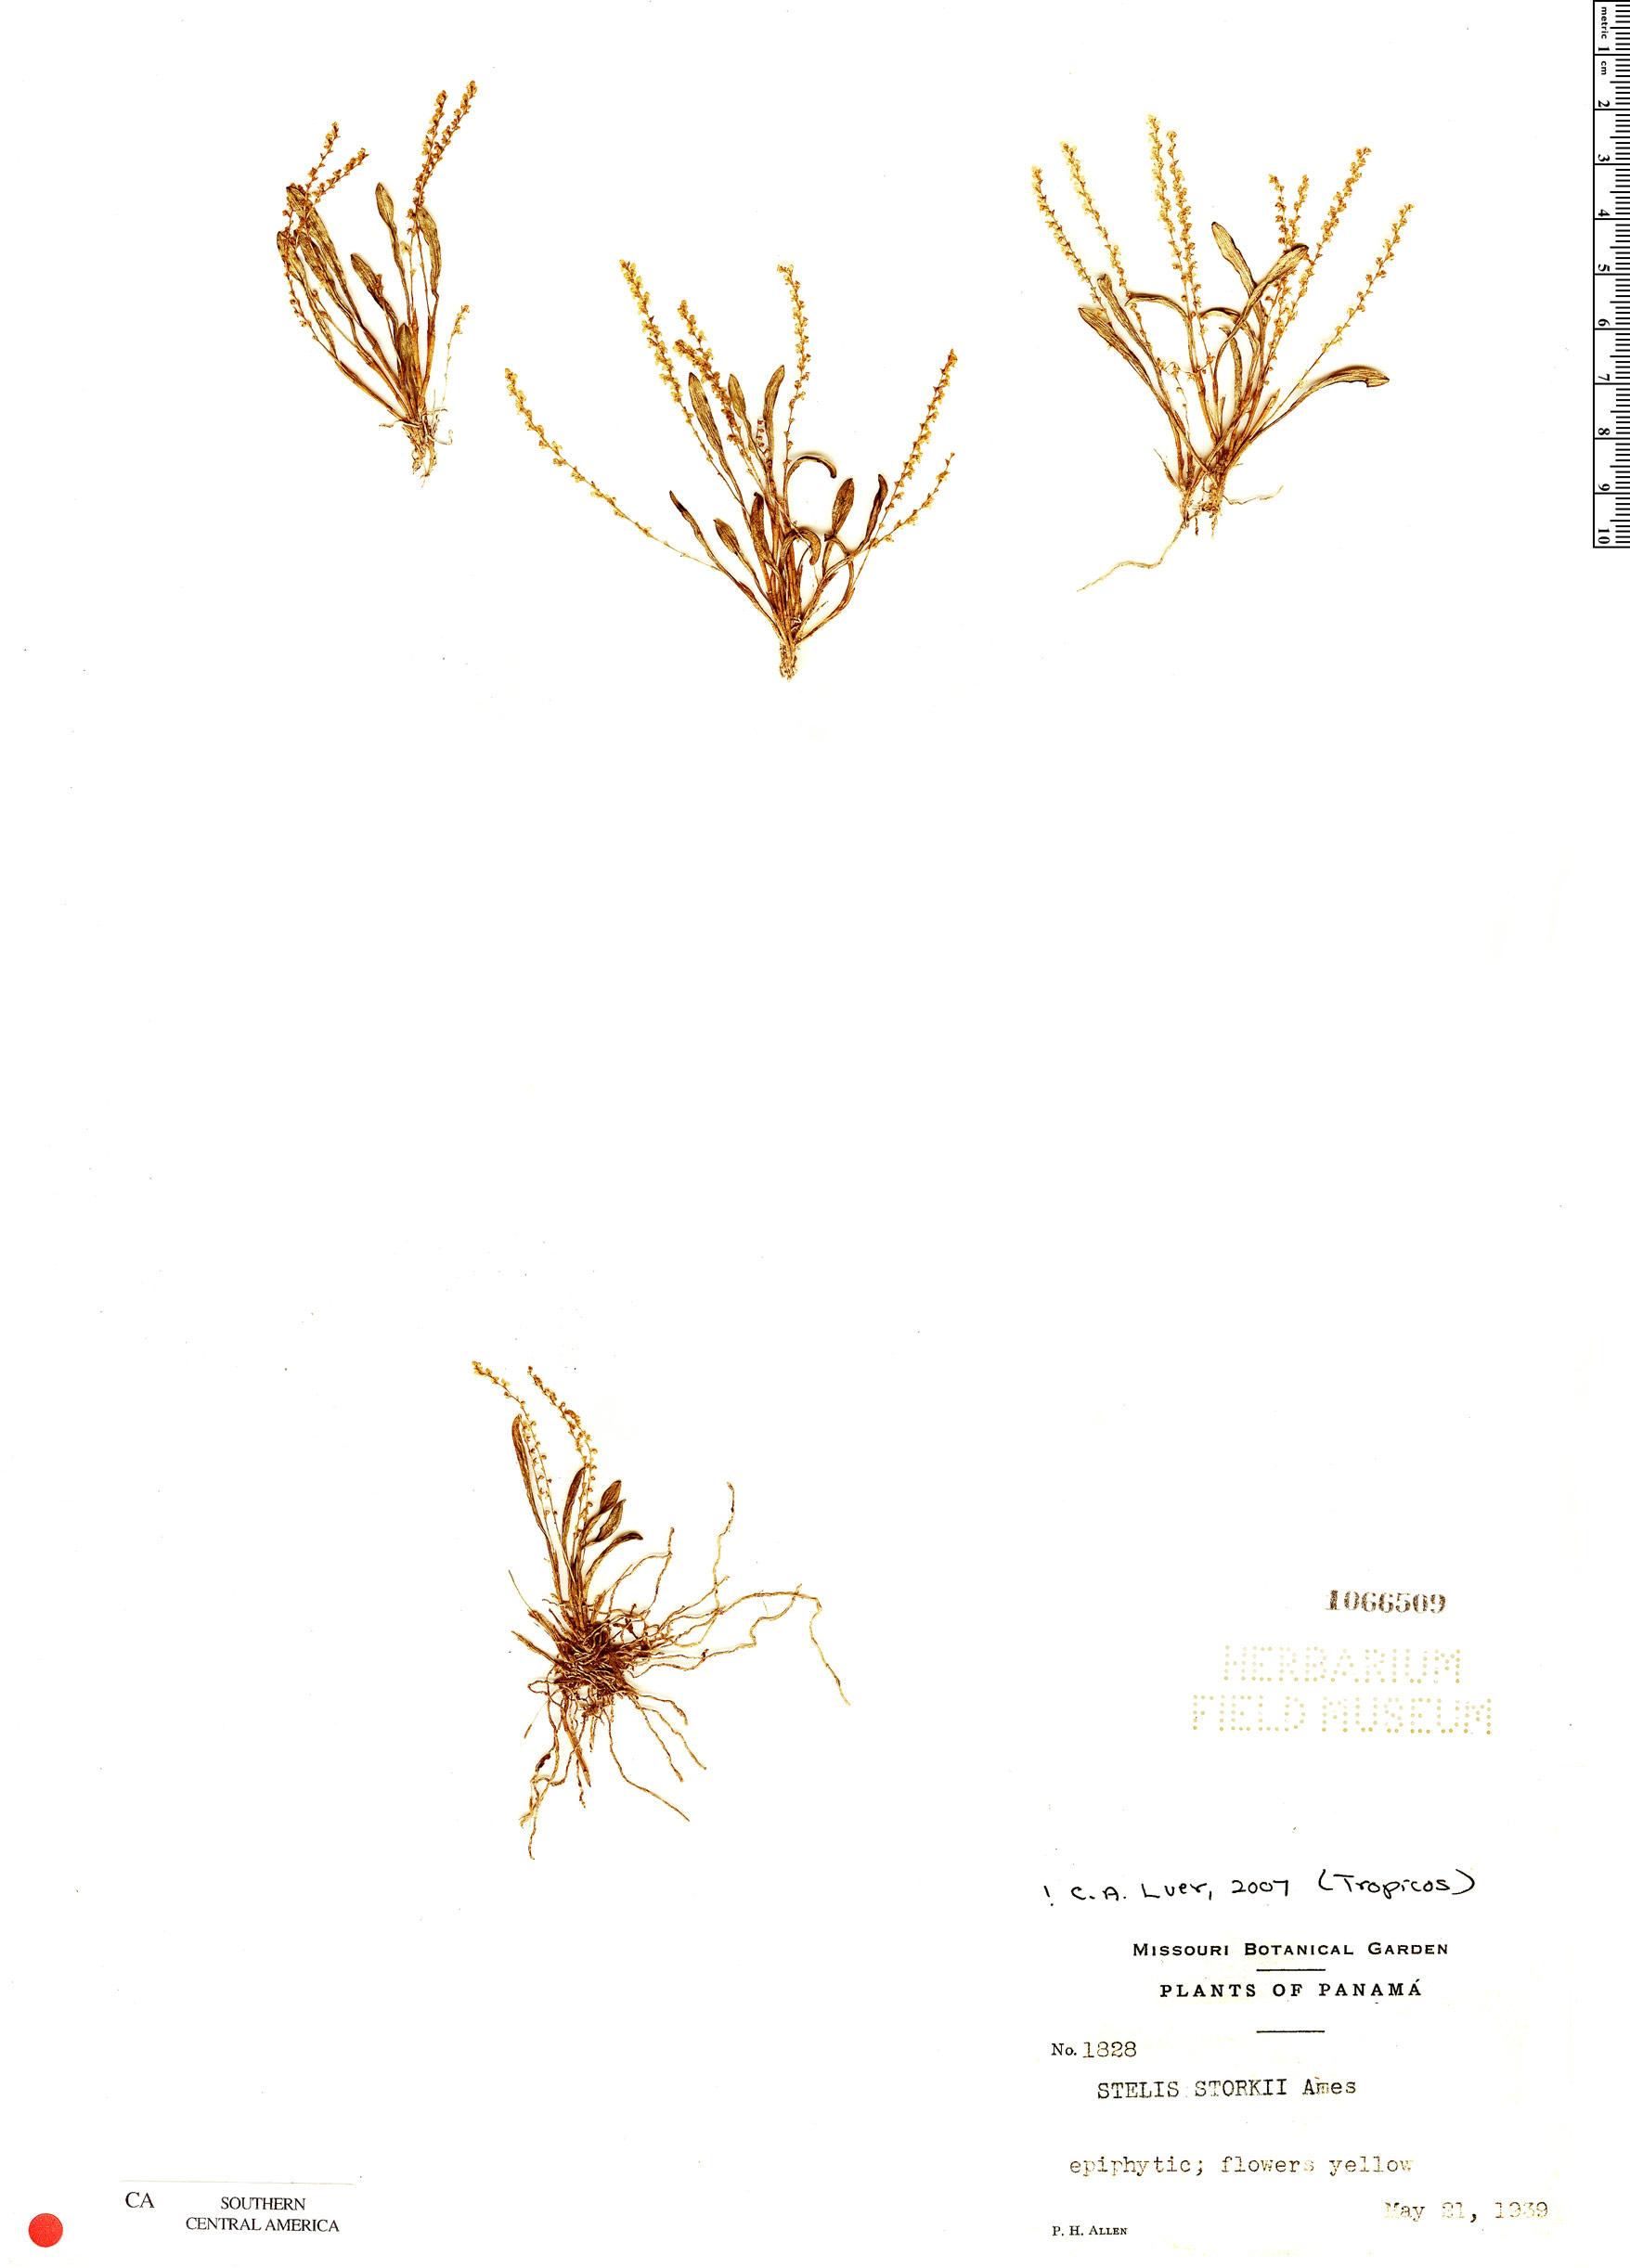 Specimen: Stelis storkii